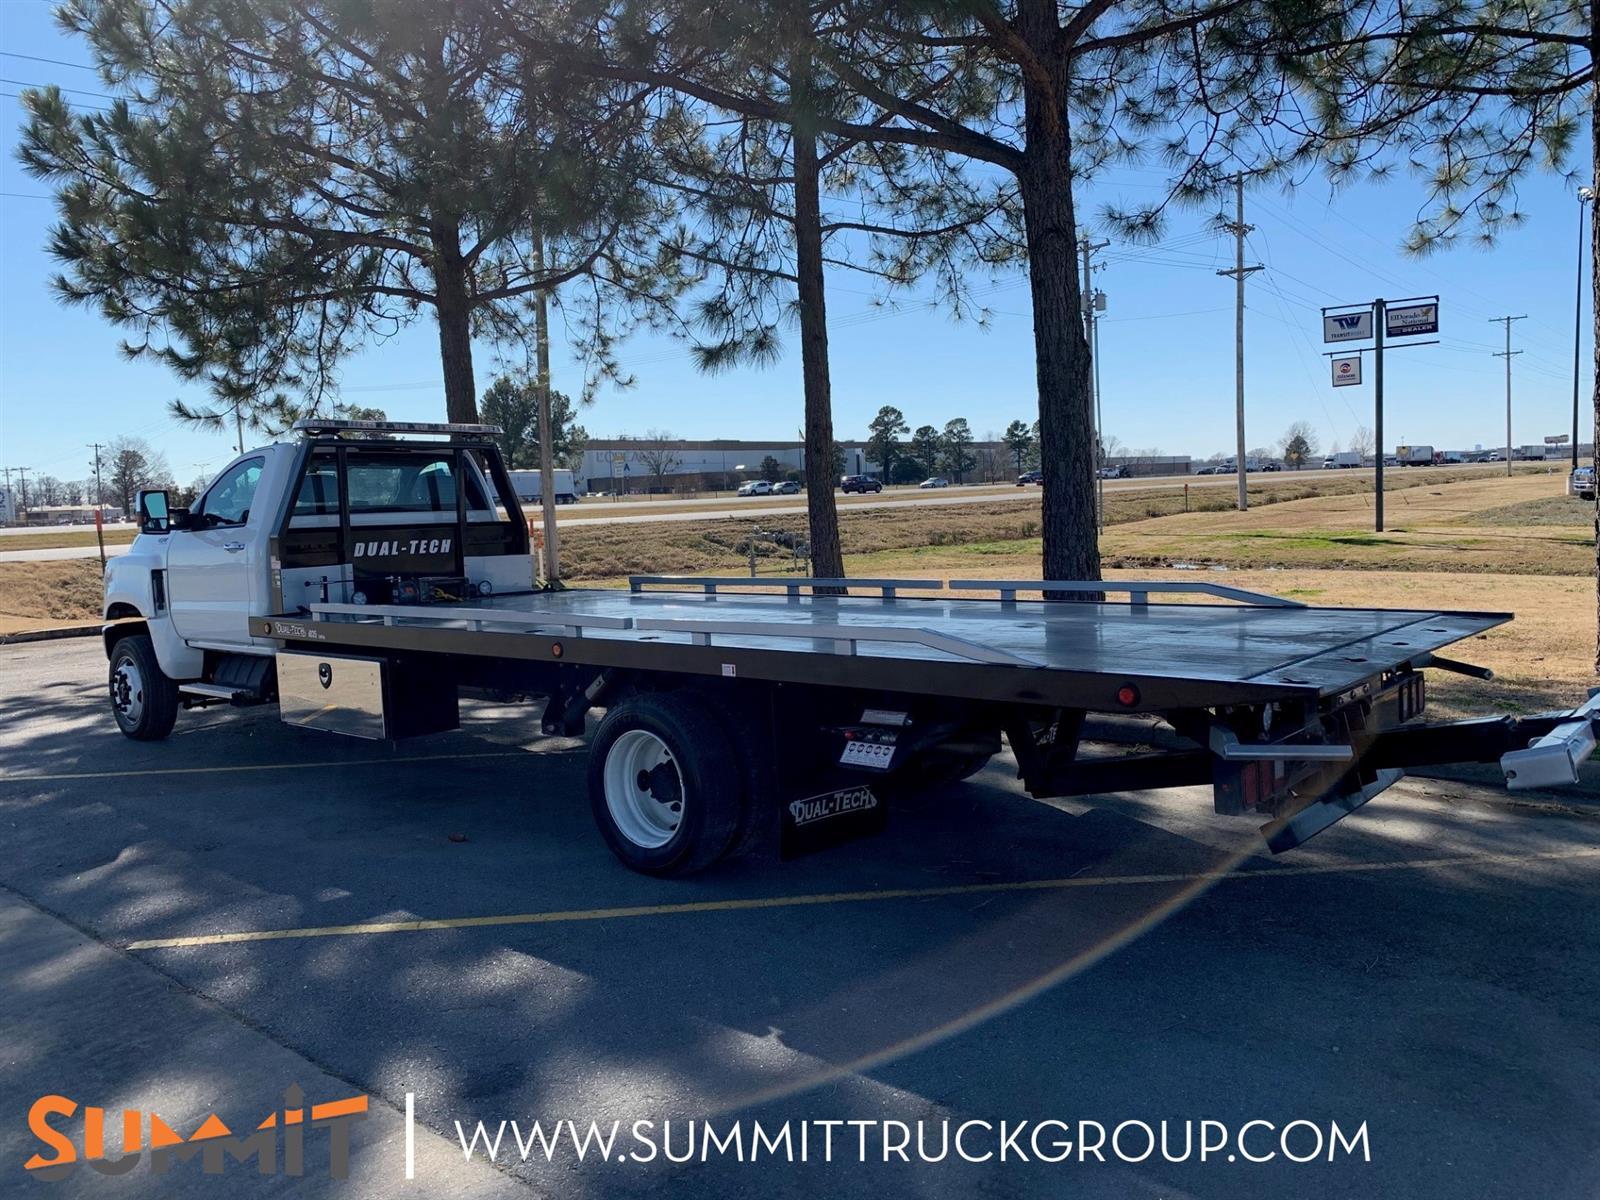 2019 International CV Regular Cab 4x4, Dual-Tech Rollback Body #210T210135 - photo 1